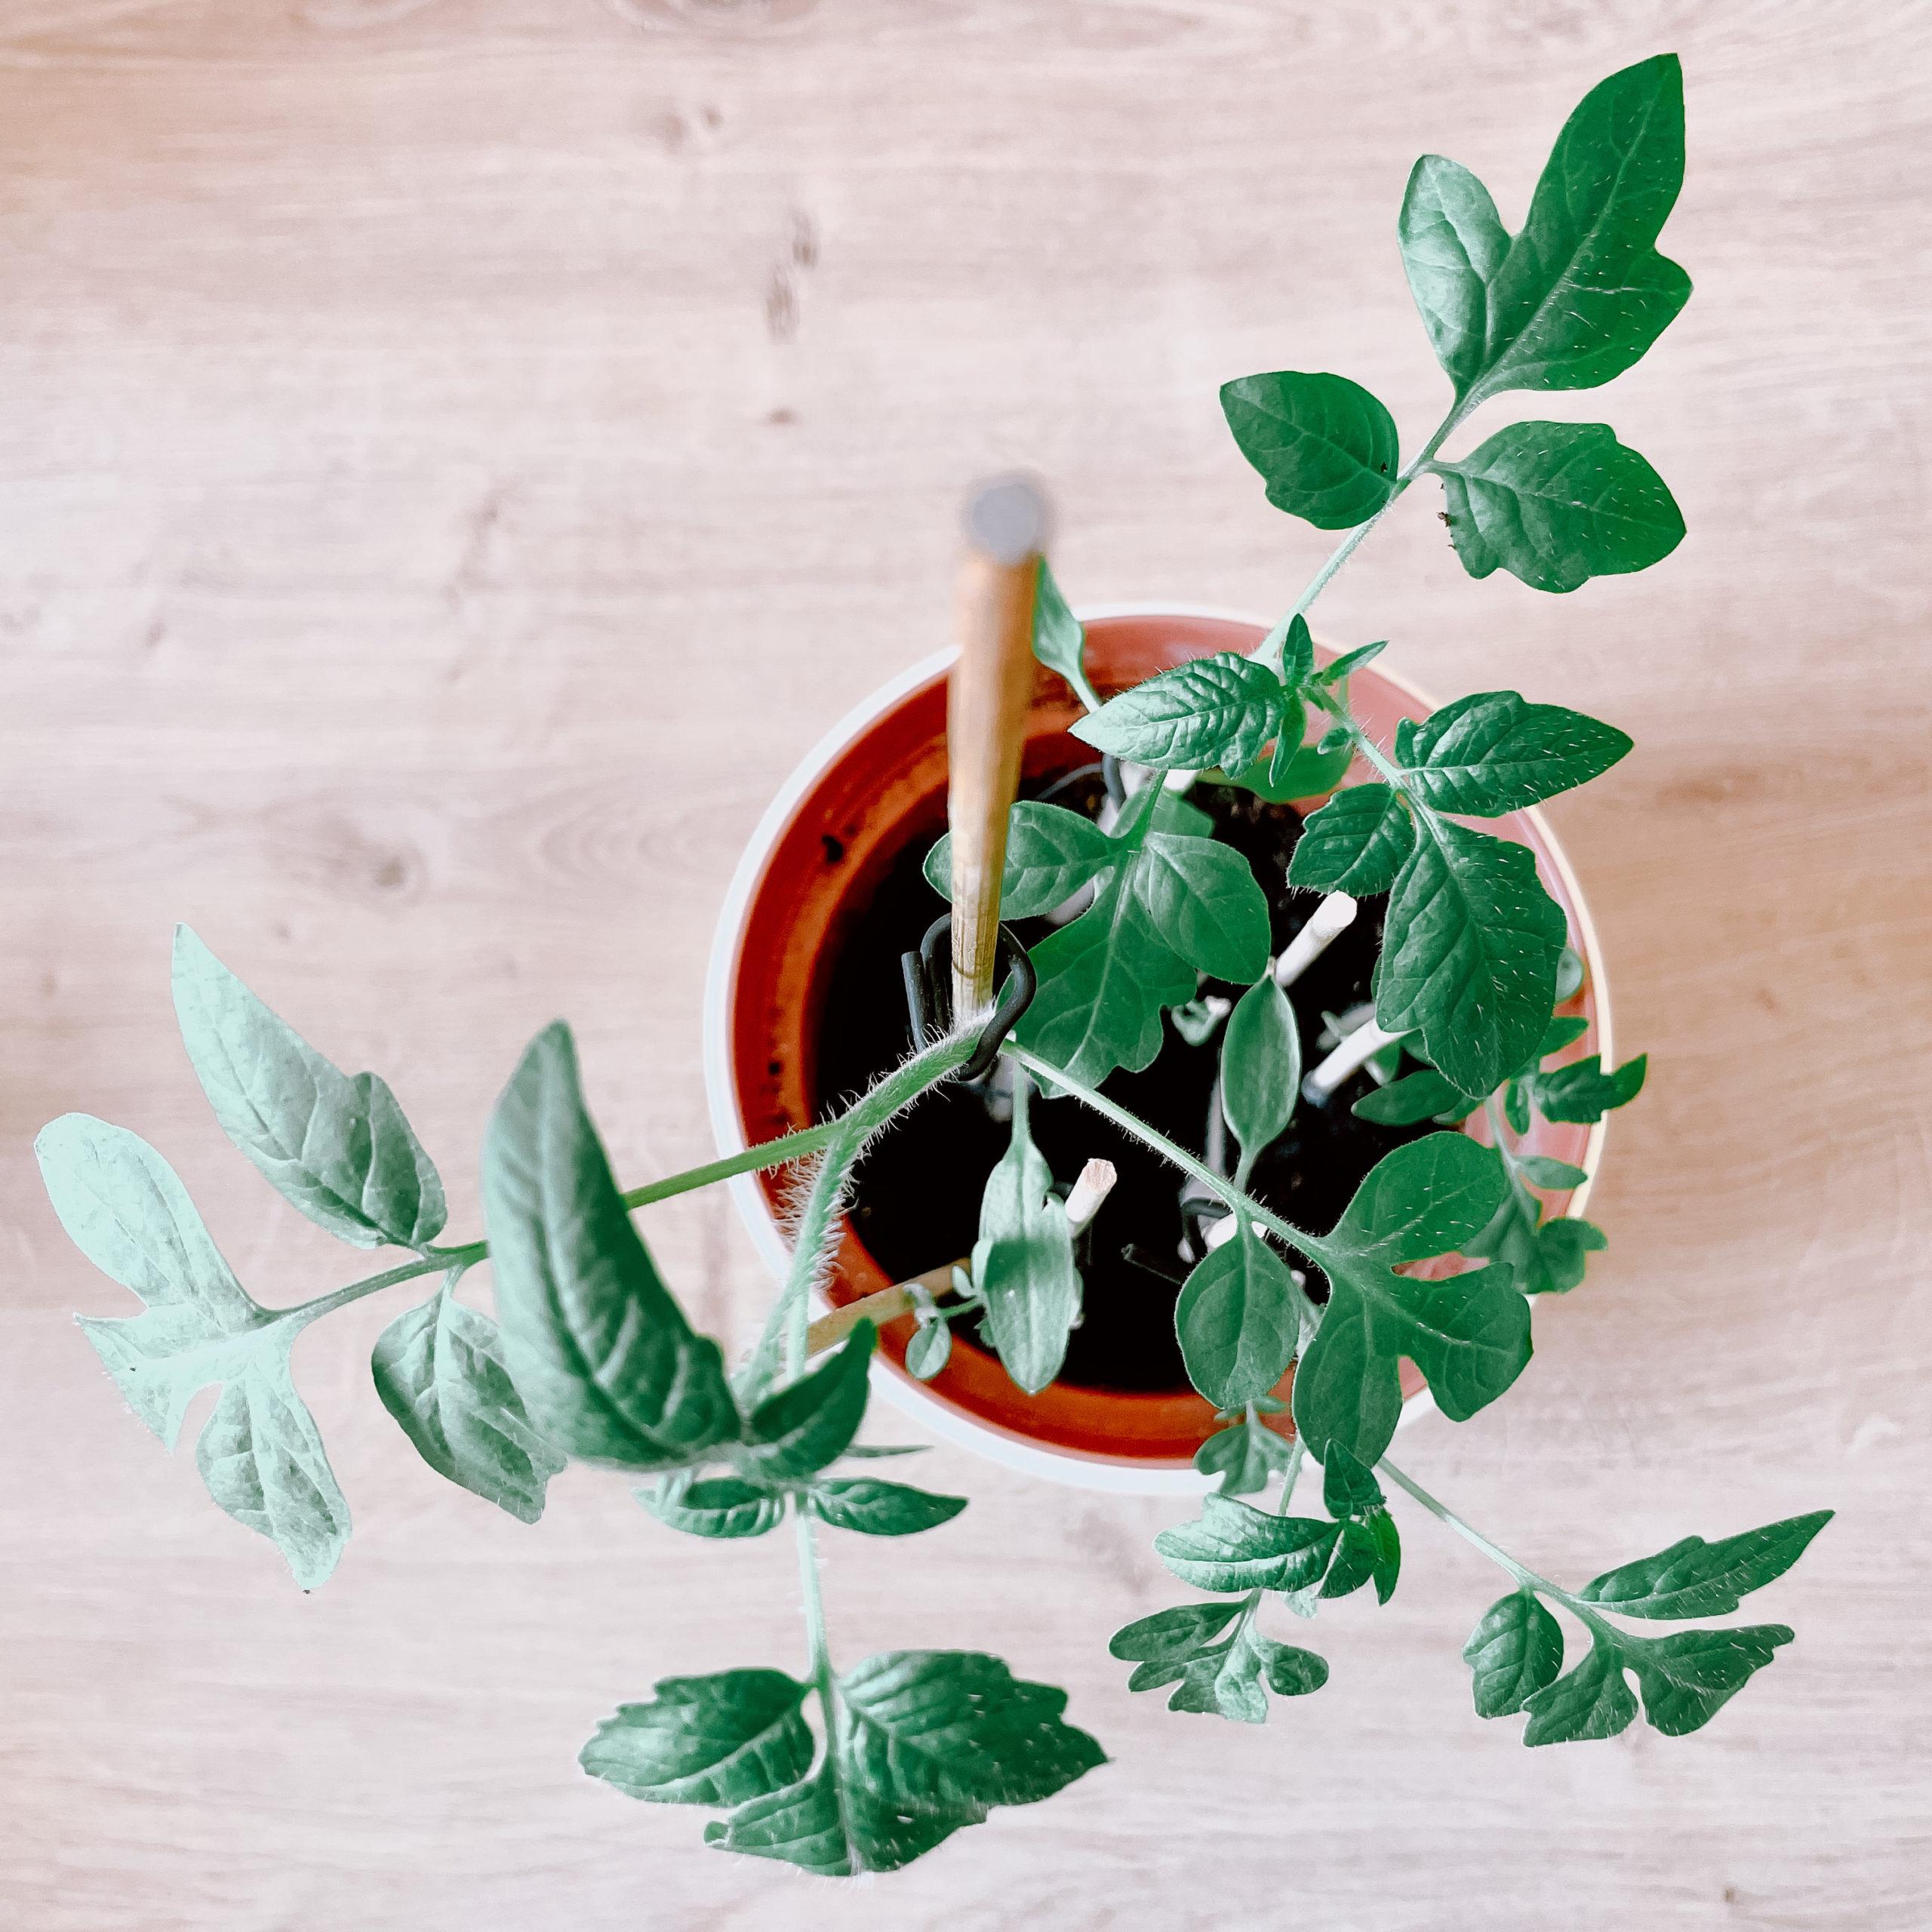 IMG 9985 scaled - The gardener's maieutics